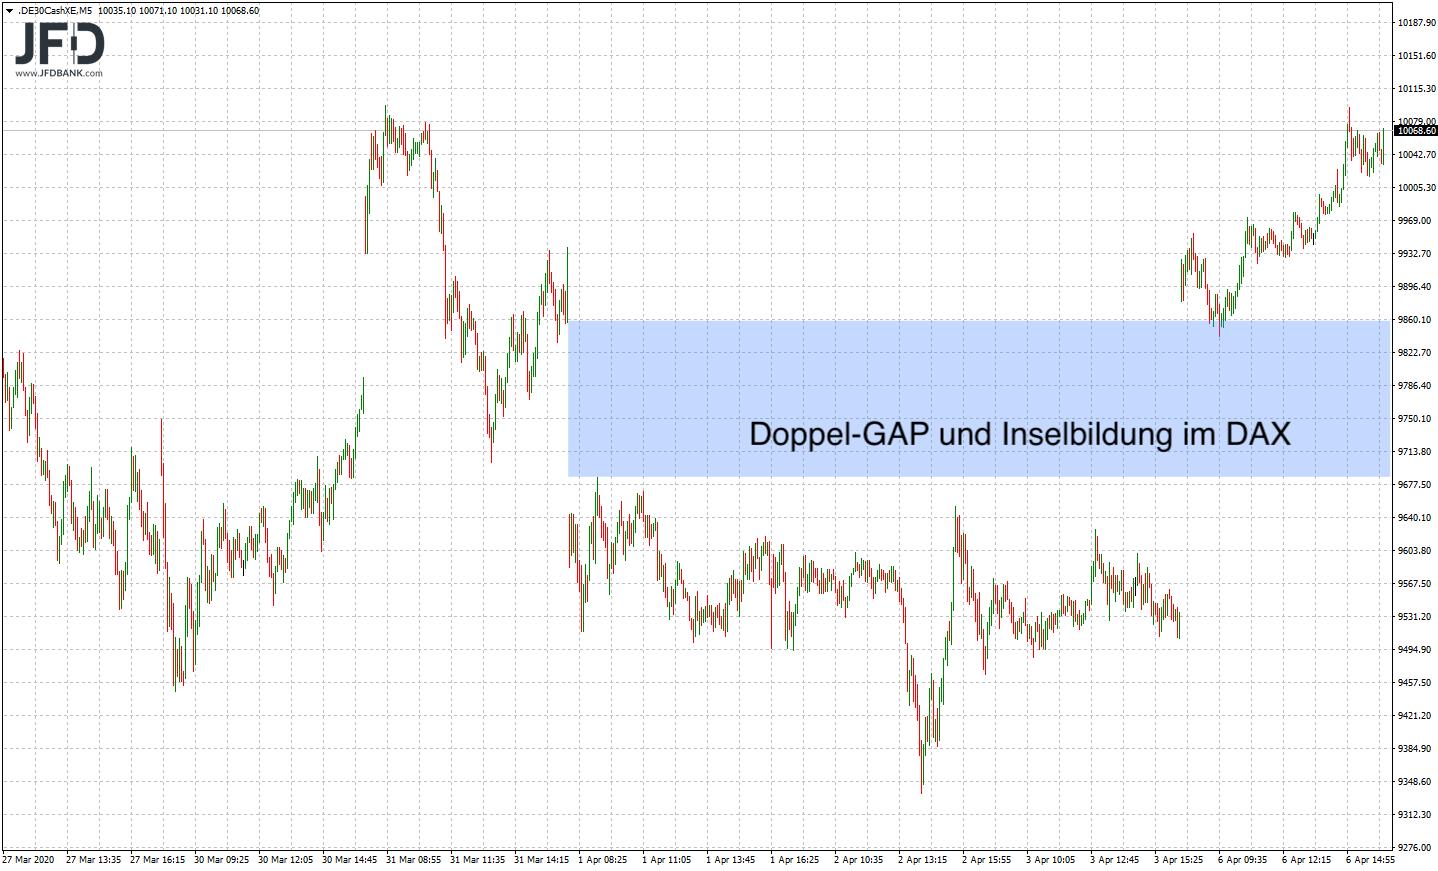 Starke-Vorosterzeit-DAX-schafft-Rückeroberung-der-10-000-Kommentar-JFD-Bank-GodmodeTrader.de-6